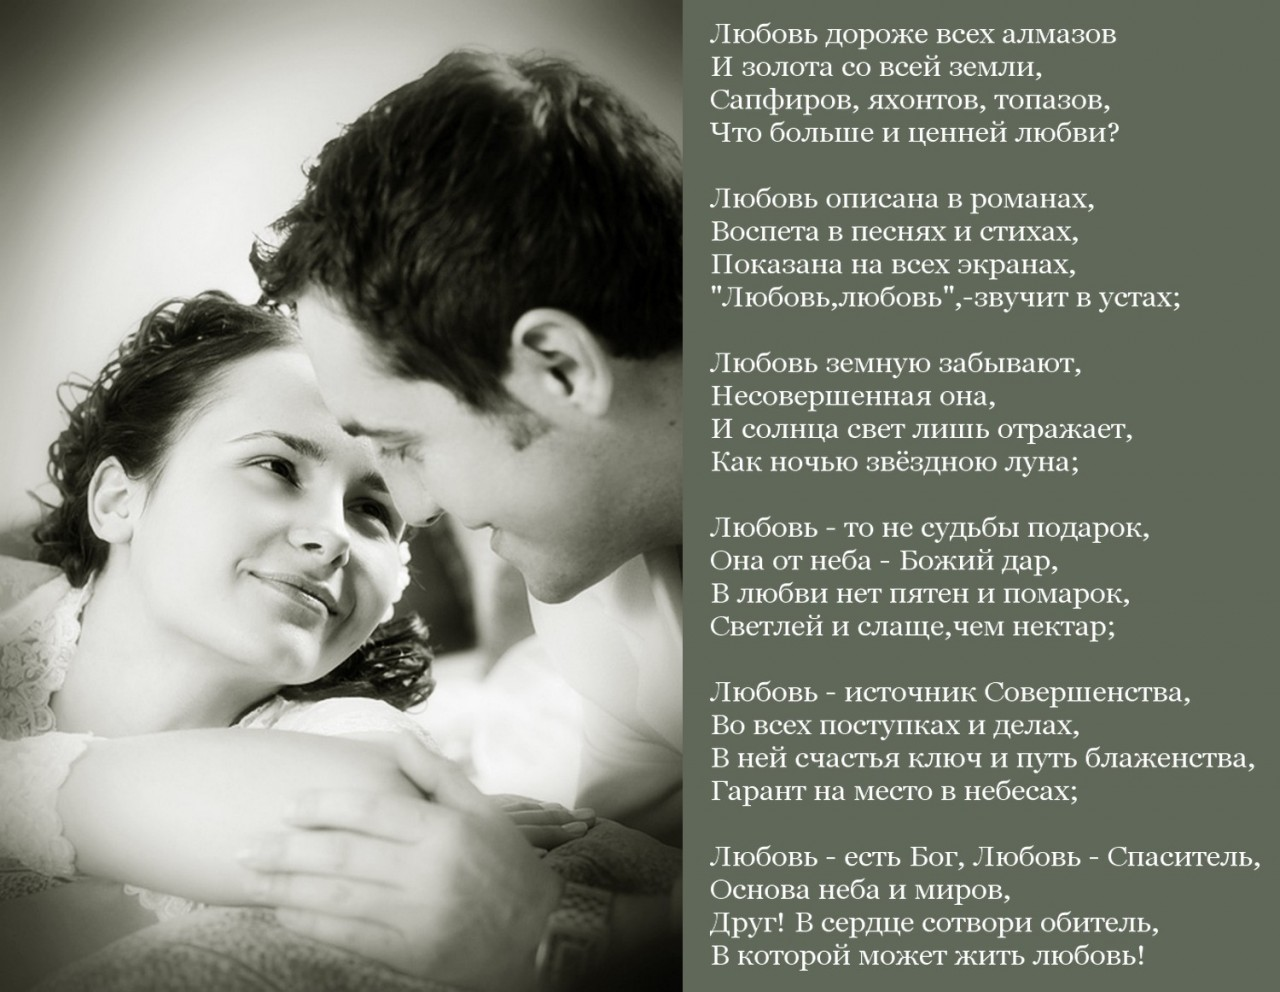 Дорогому стихи о любви картинки